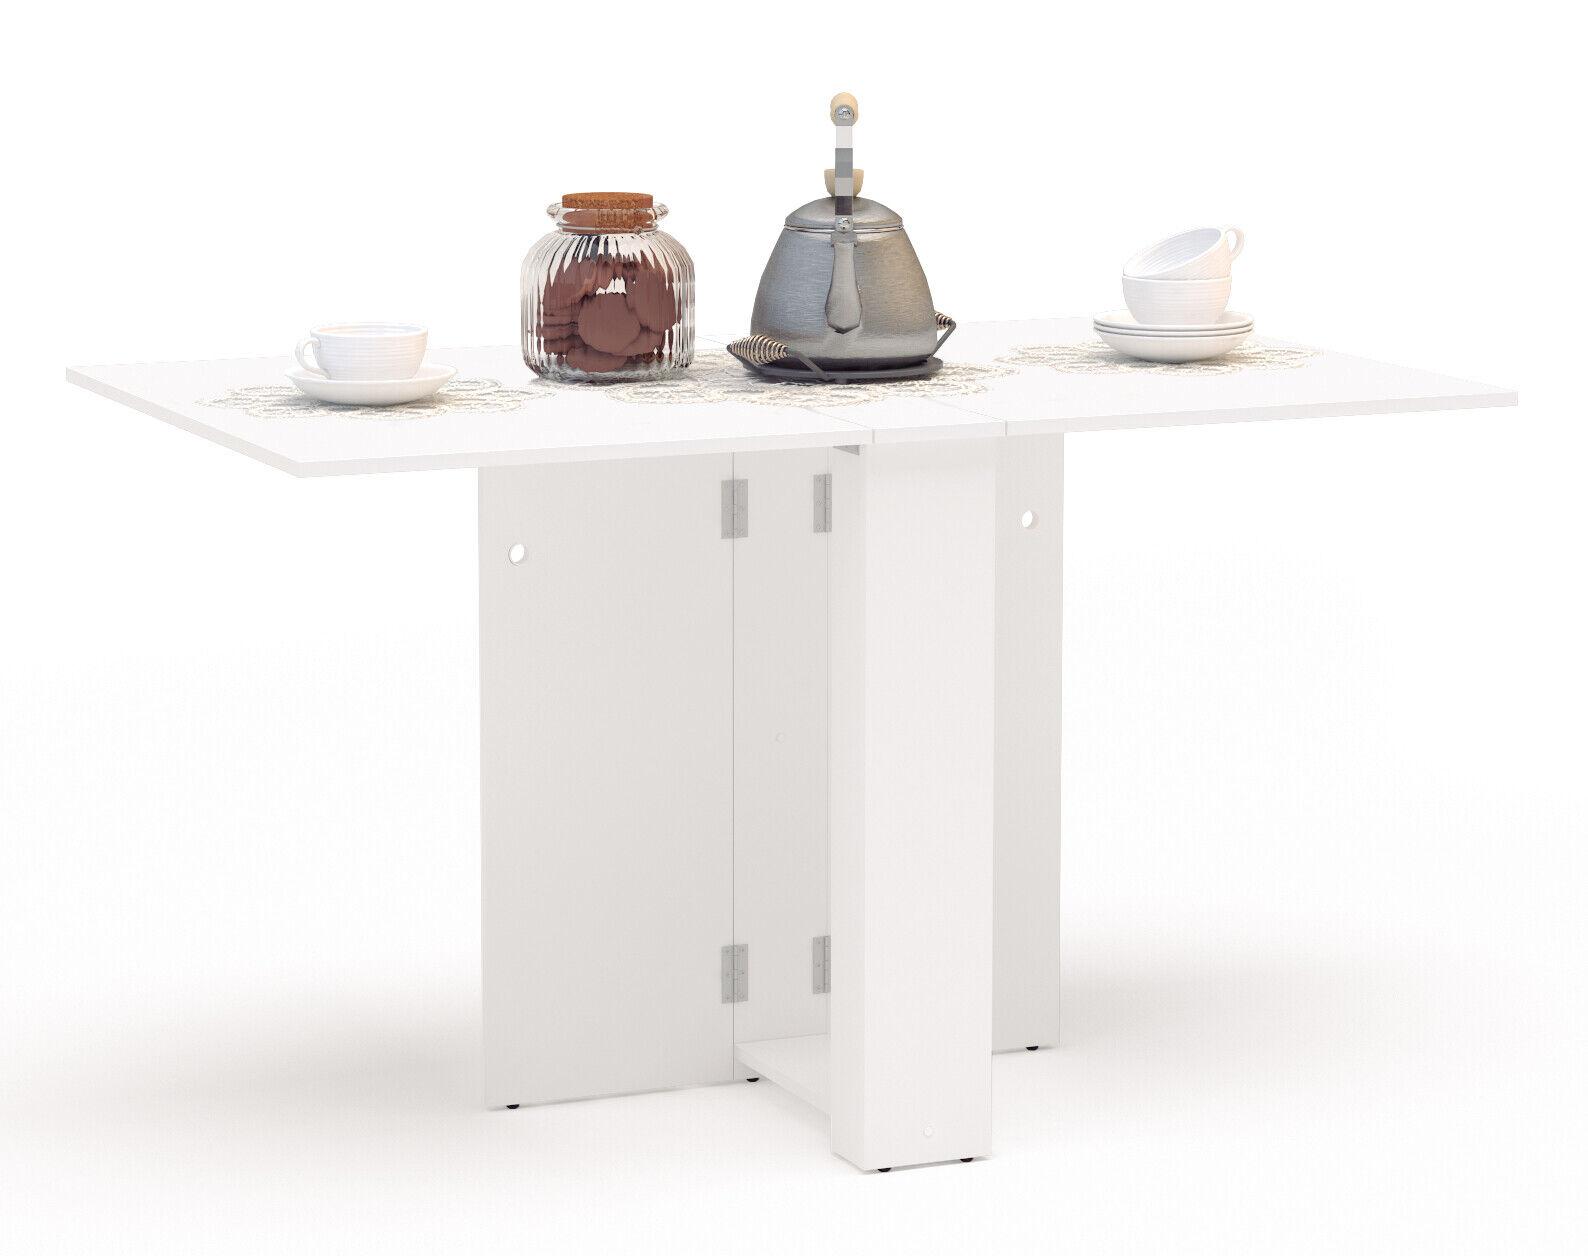 Mesa cocina Swing abatible plegable color blanca moderna mueble 18-132x75x80 cm